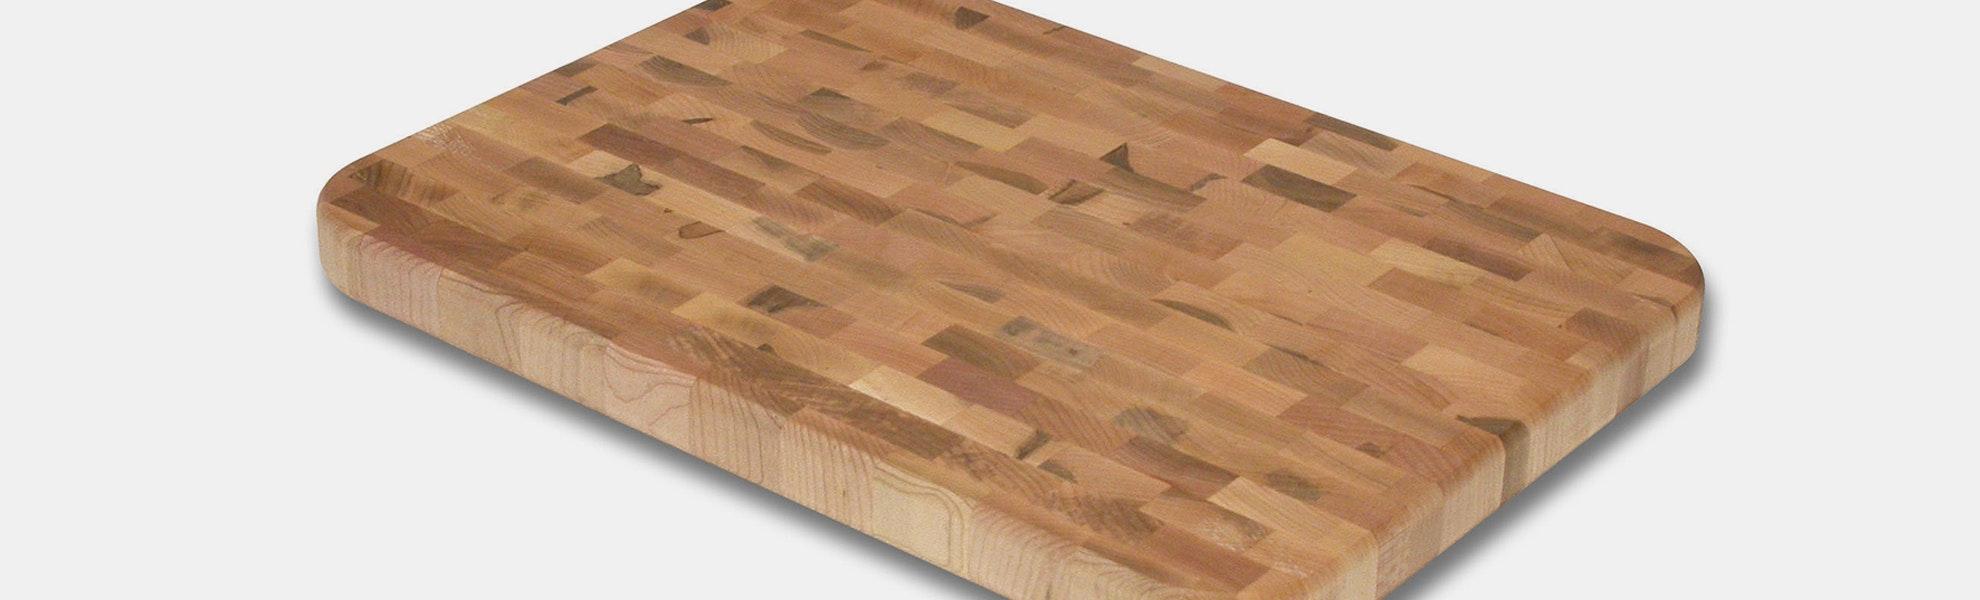 "Snow River 12"" Maple End Grain Cutting Board"